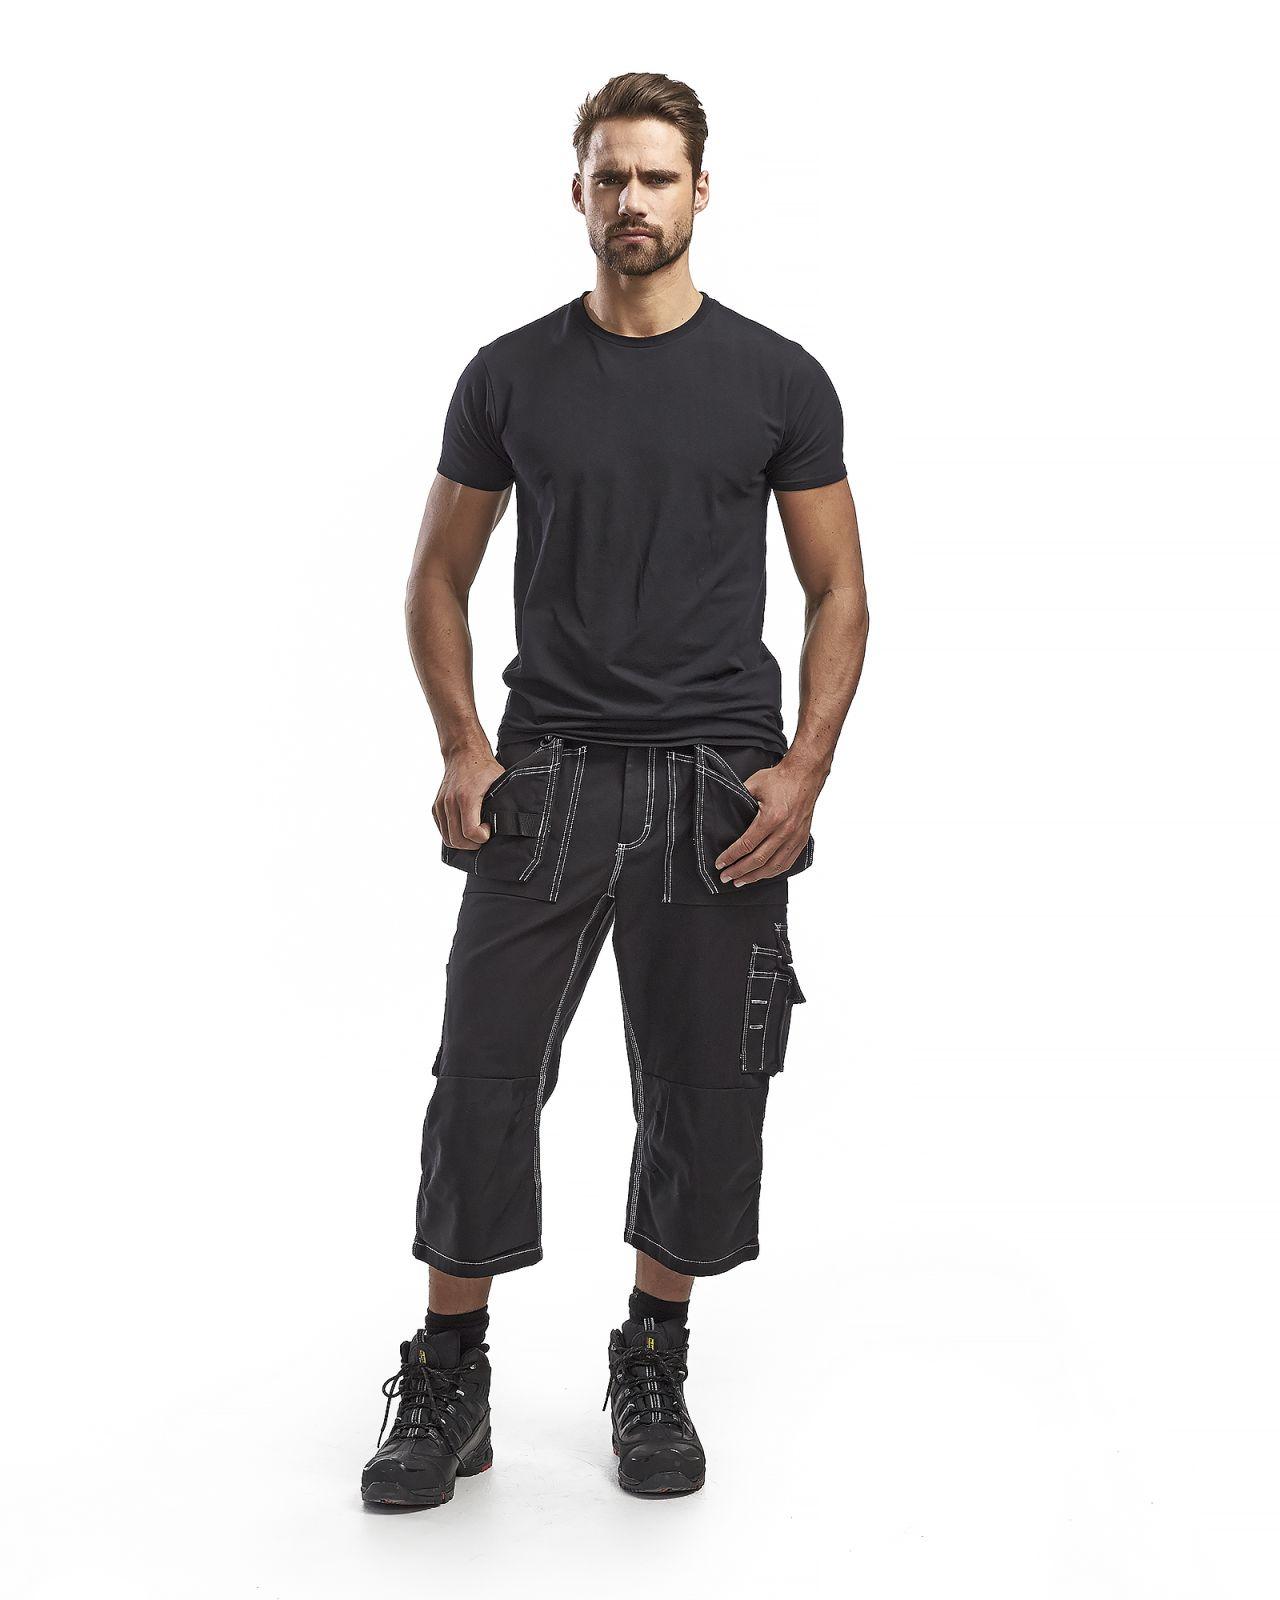 Blaklader Piraatbroeken 15401370 zwart(9900)